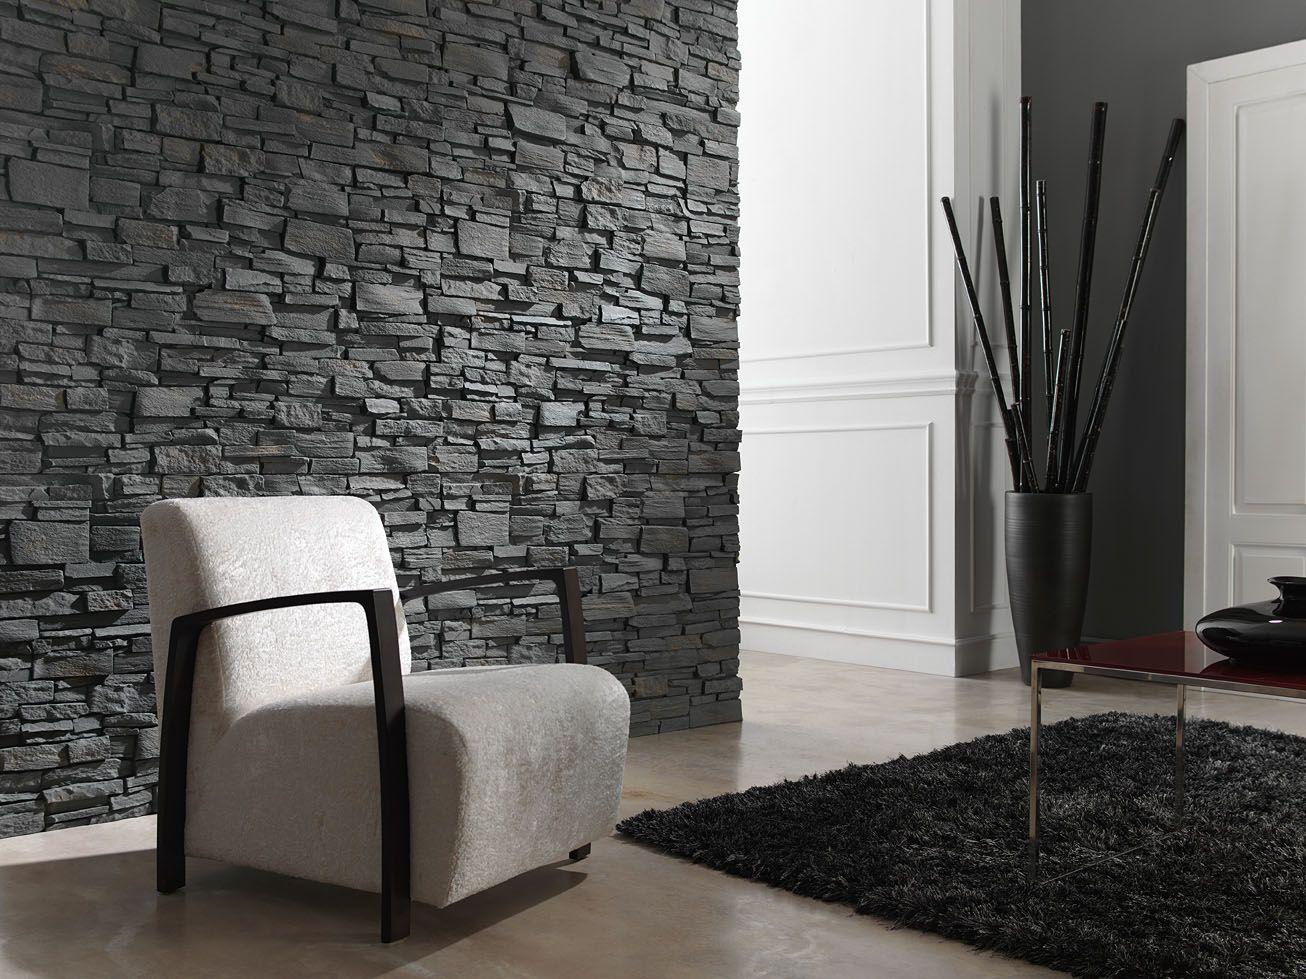 Muro piedra living deco muro piedras pinterest for Piedra para muros interiores